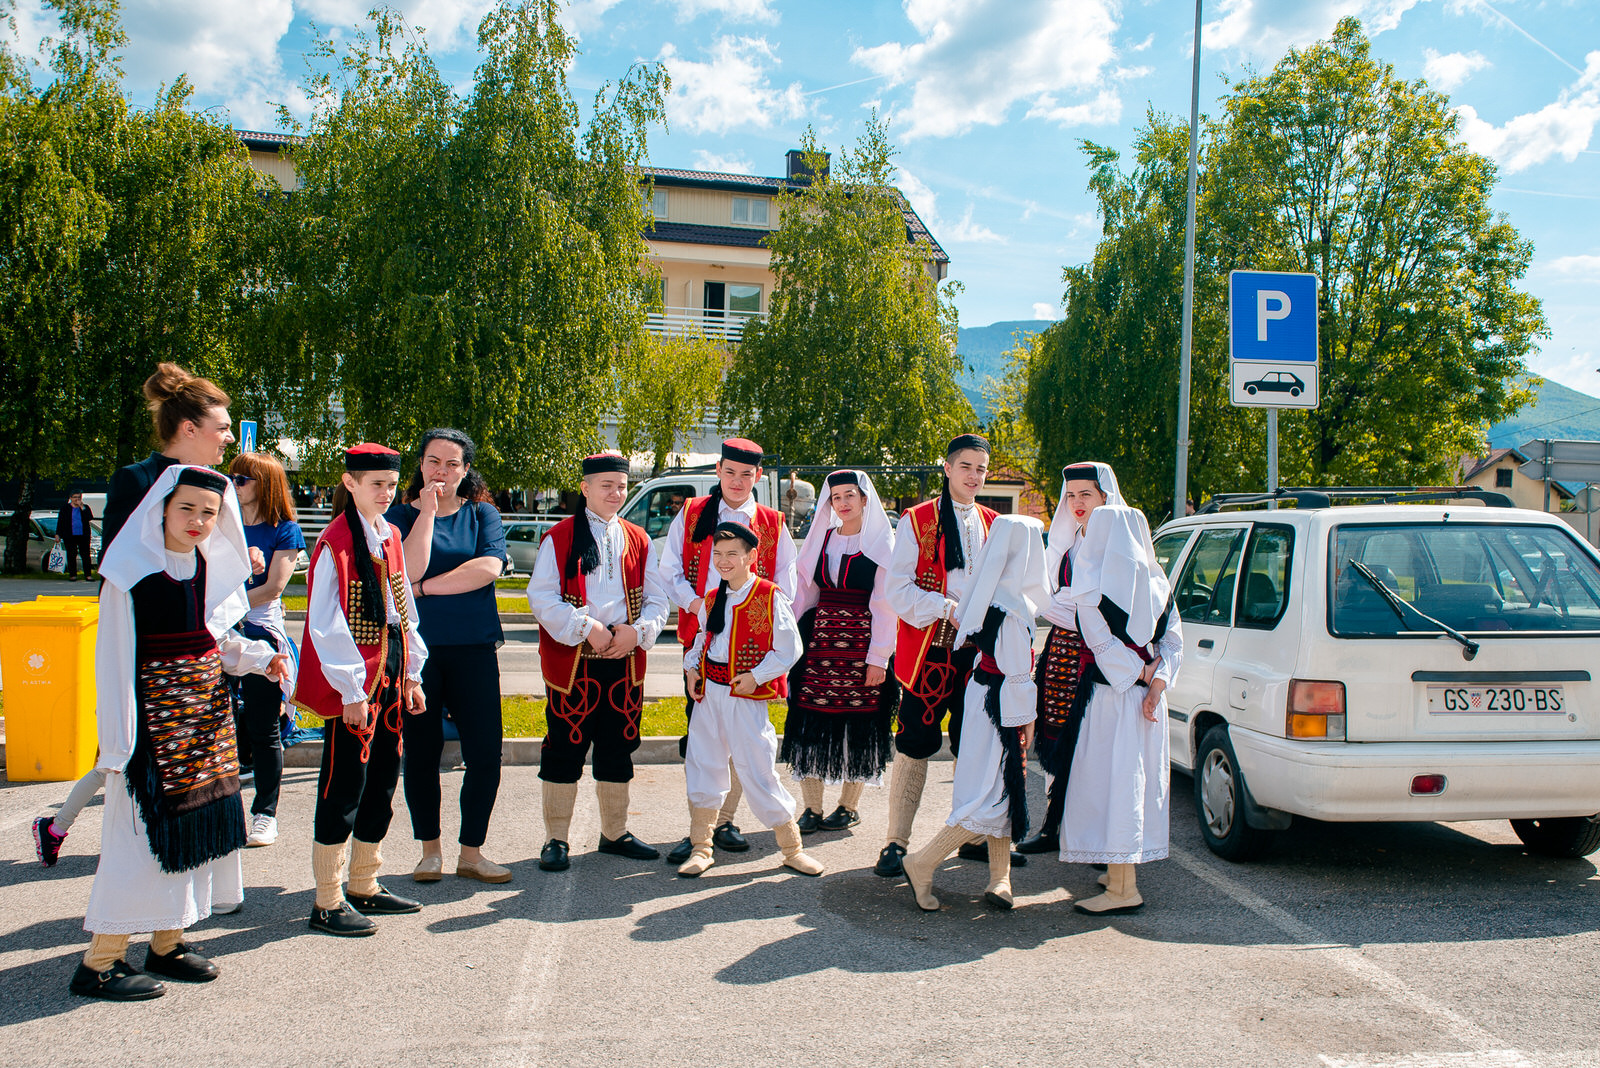 likaclub_korenica_dan-medvjeđeg-luka_2019-17